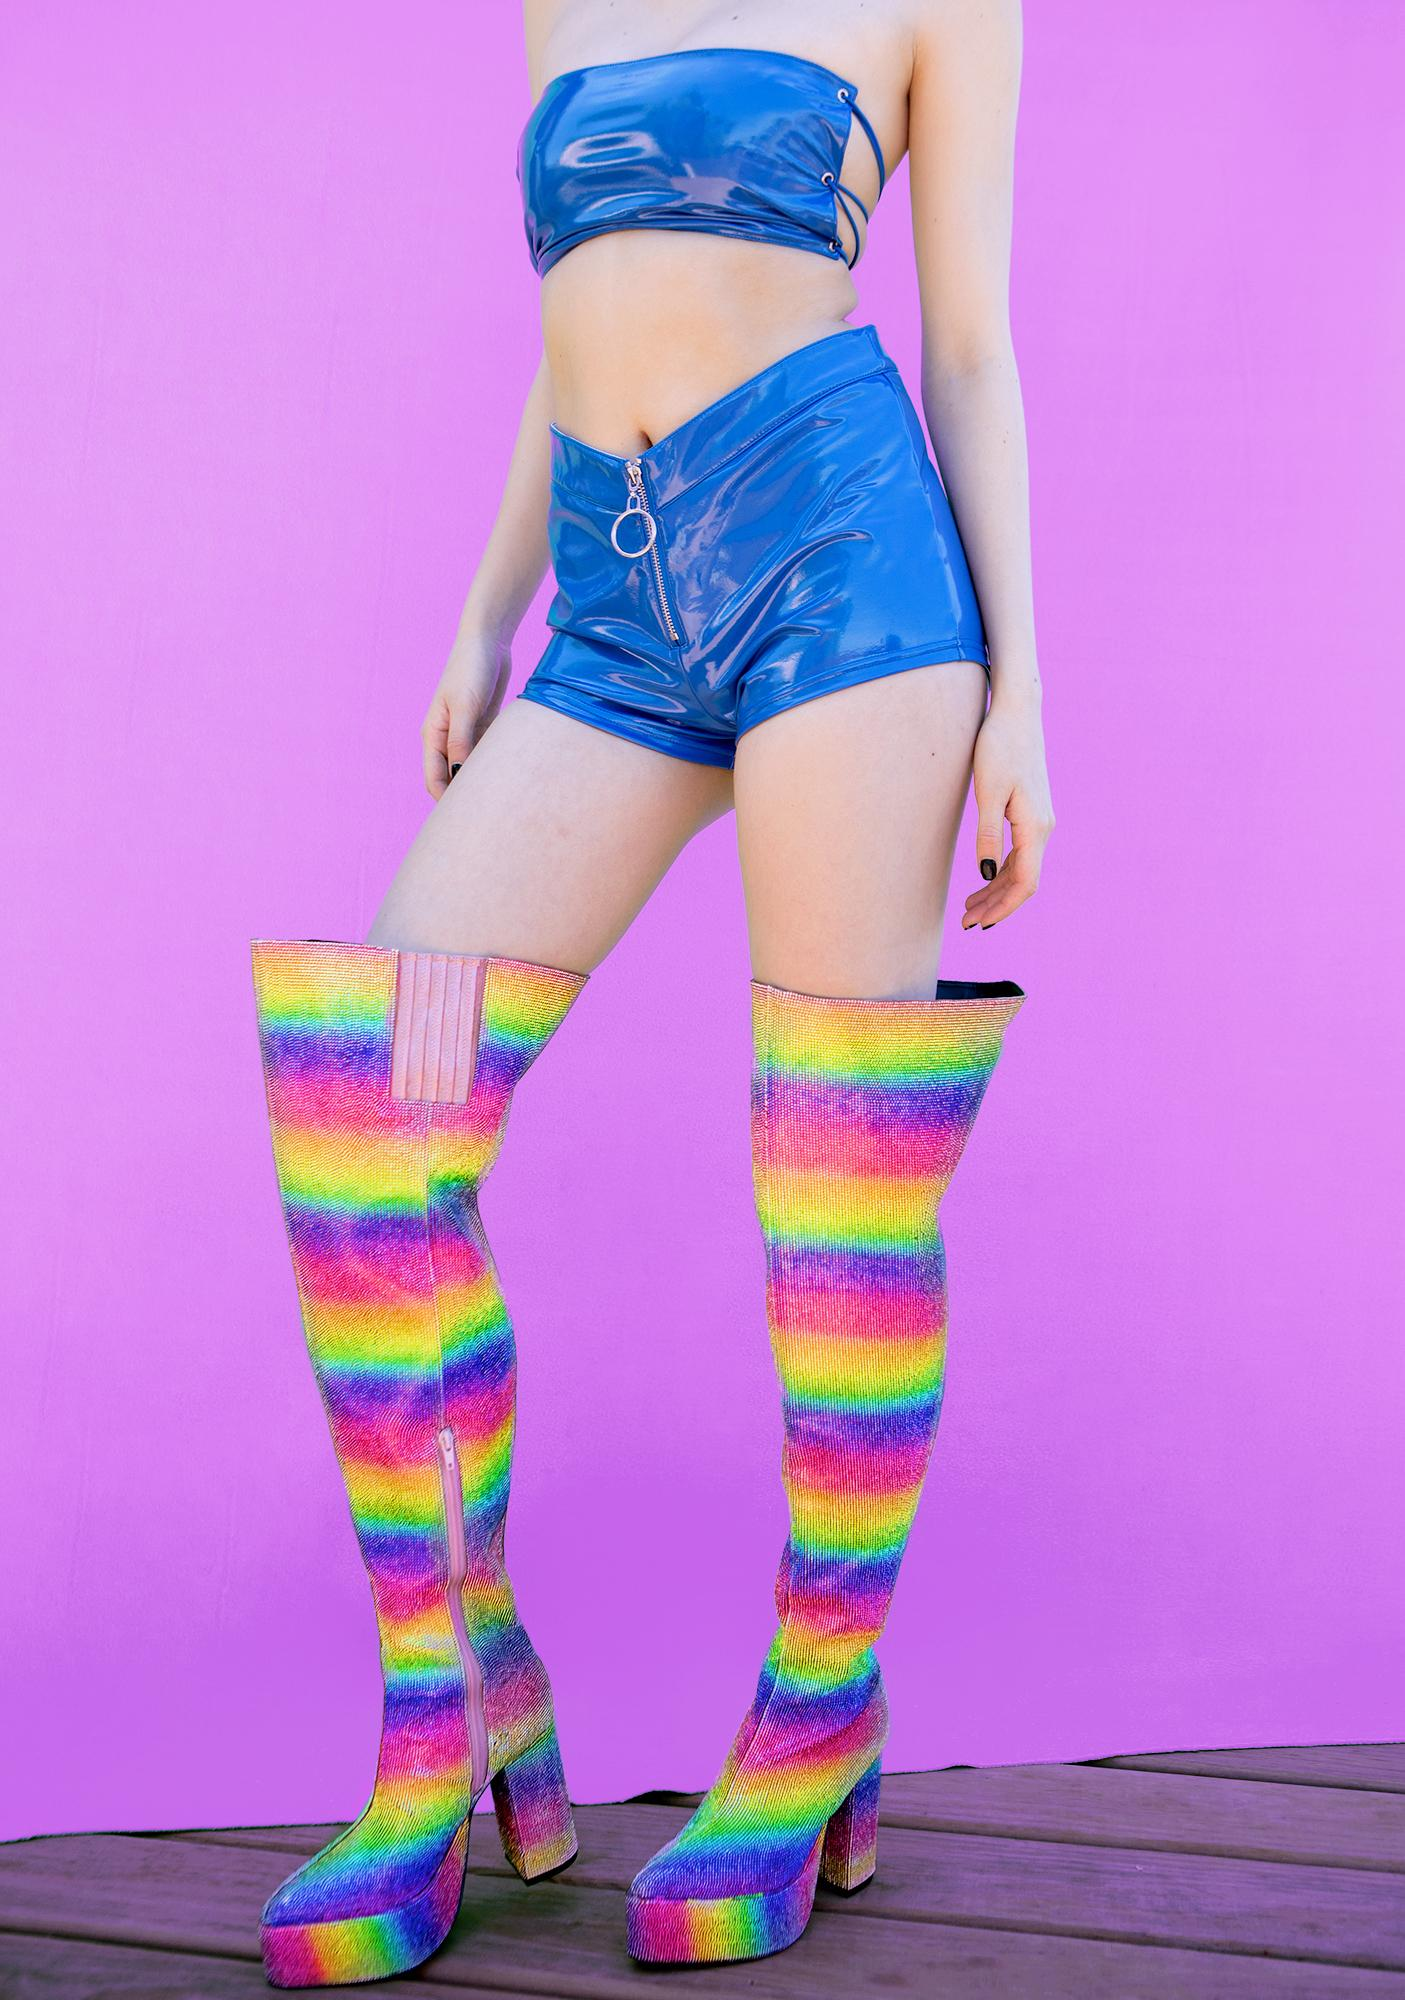 Club Exx Crystal Queer Thigh High Boots